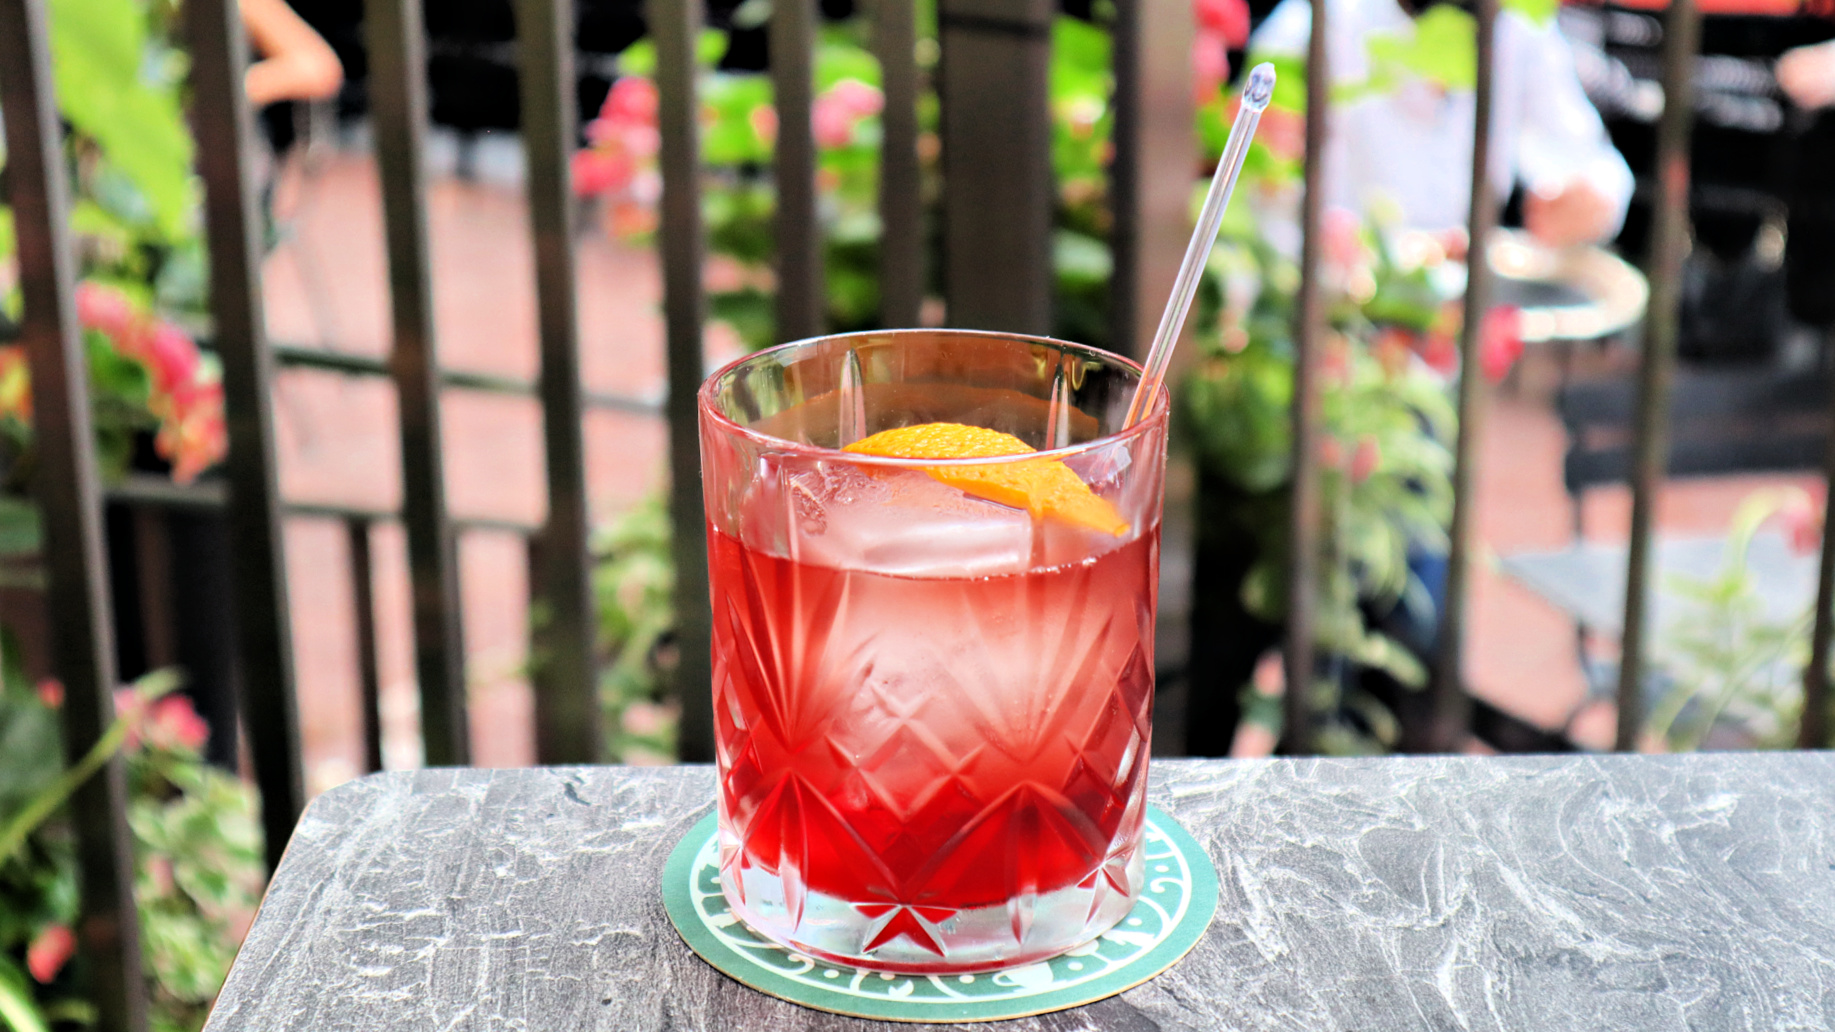 The Rabbit Hole cocktails